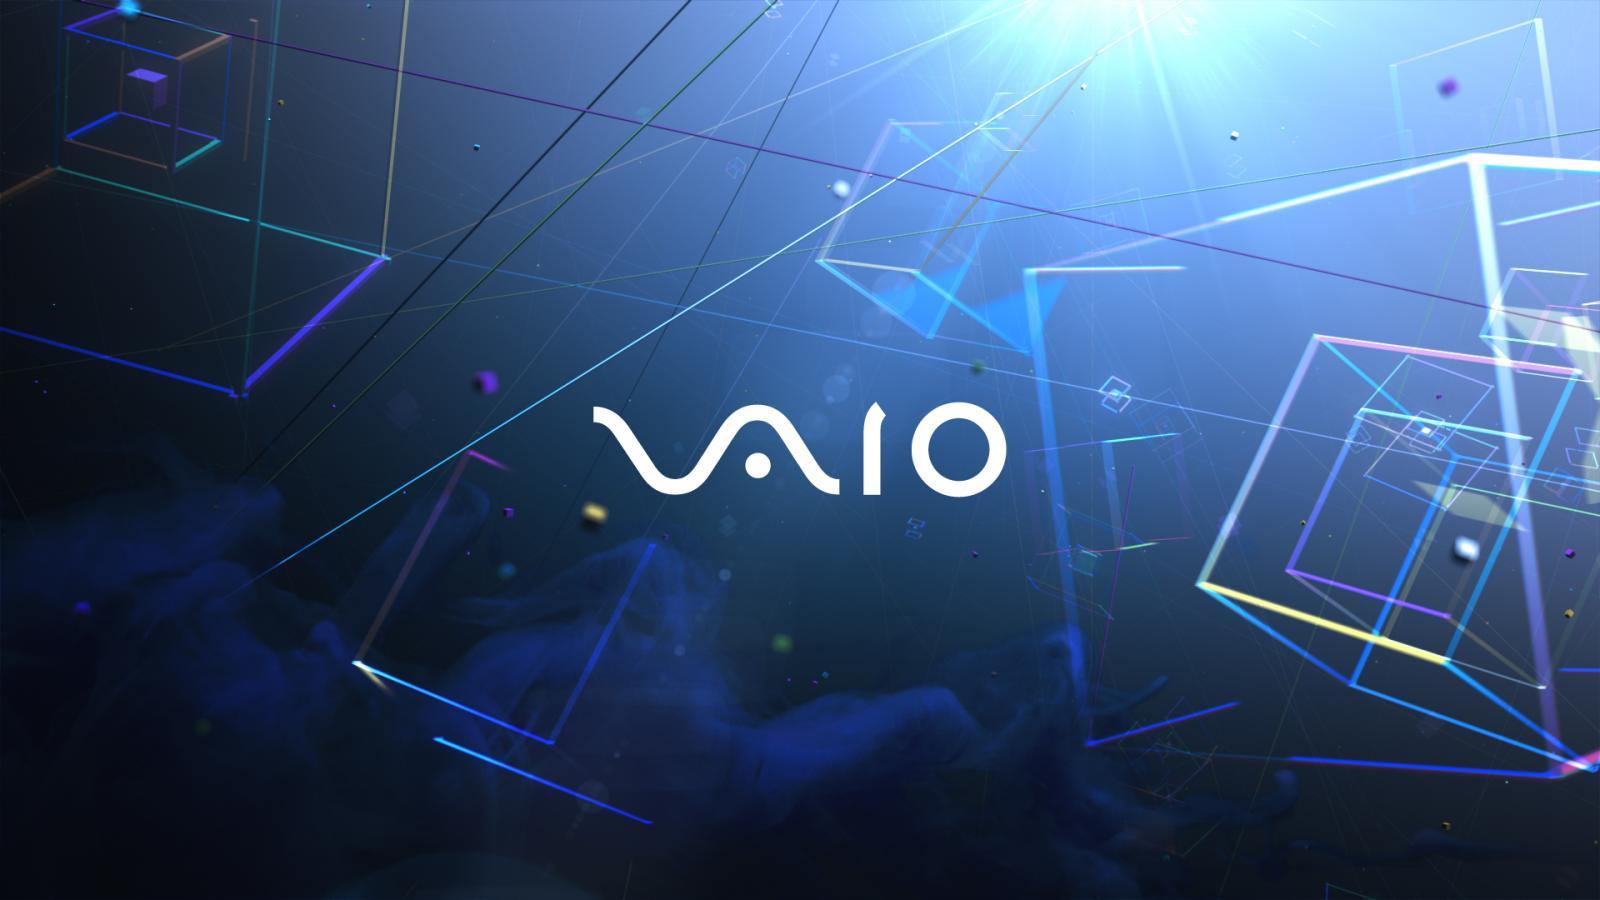 Vaio Wallpaper 1280x800: VAIO Wallpaper 1920x1080